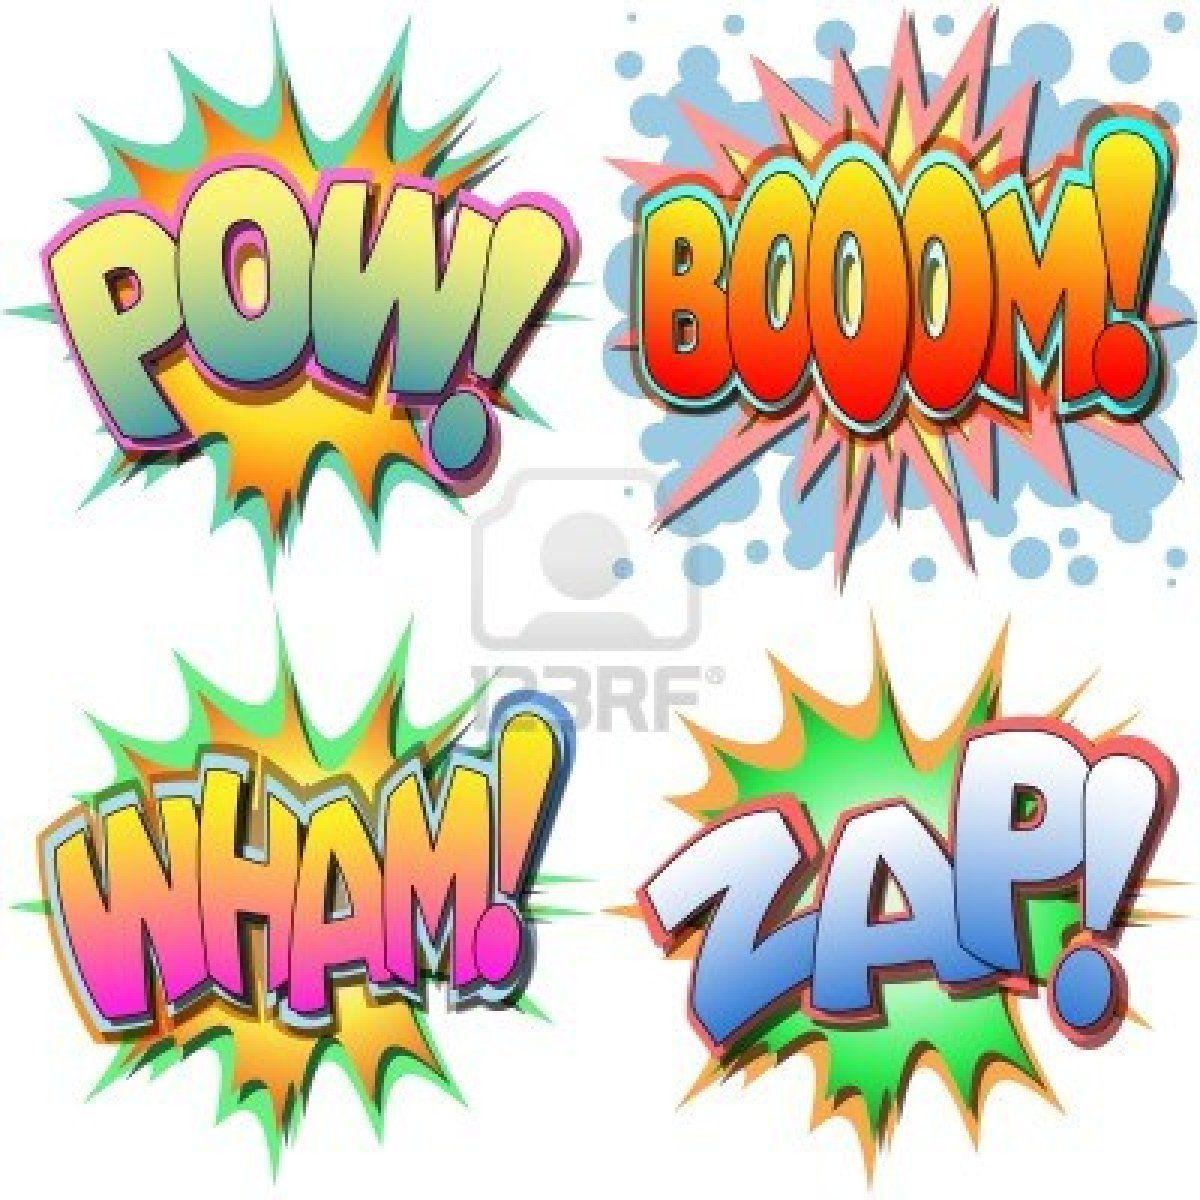 A Selection Of Comic Book Illustrations Pow Boom Wham Zap Comic Books Illustration Book Illustration Art Pop Art Wallpaper